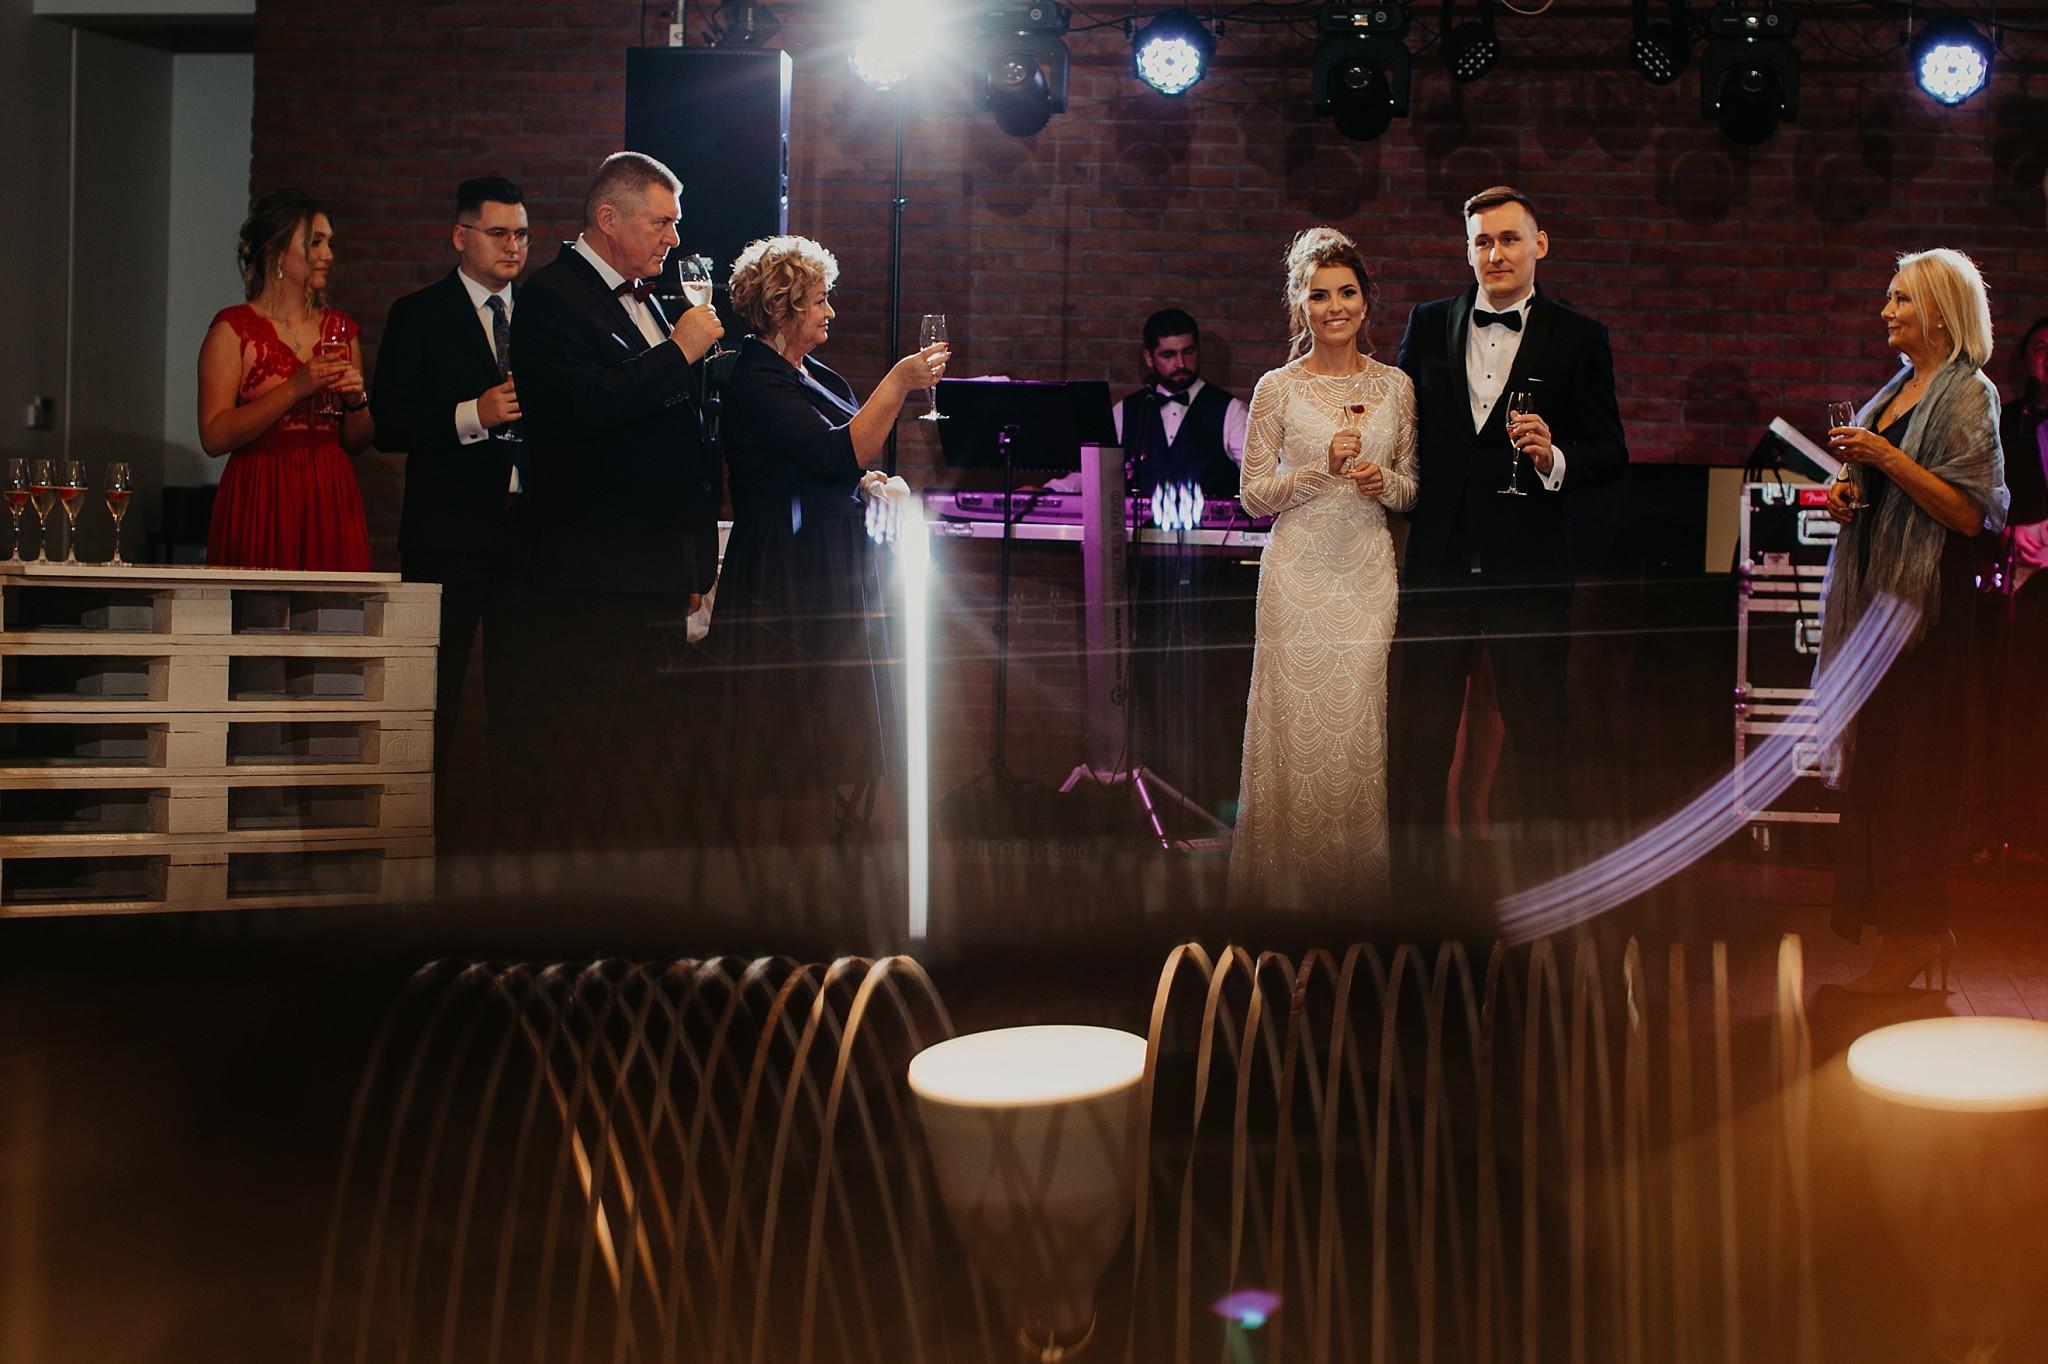 fotograf poznan wesele dobra truskawka piekne wesele pod poznaniem wesele w dobrej truskawce piekna para mloda slub marzen slub koronawirus slub listopad wesele koronawirus 295